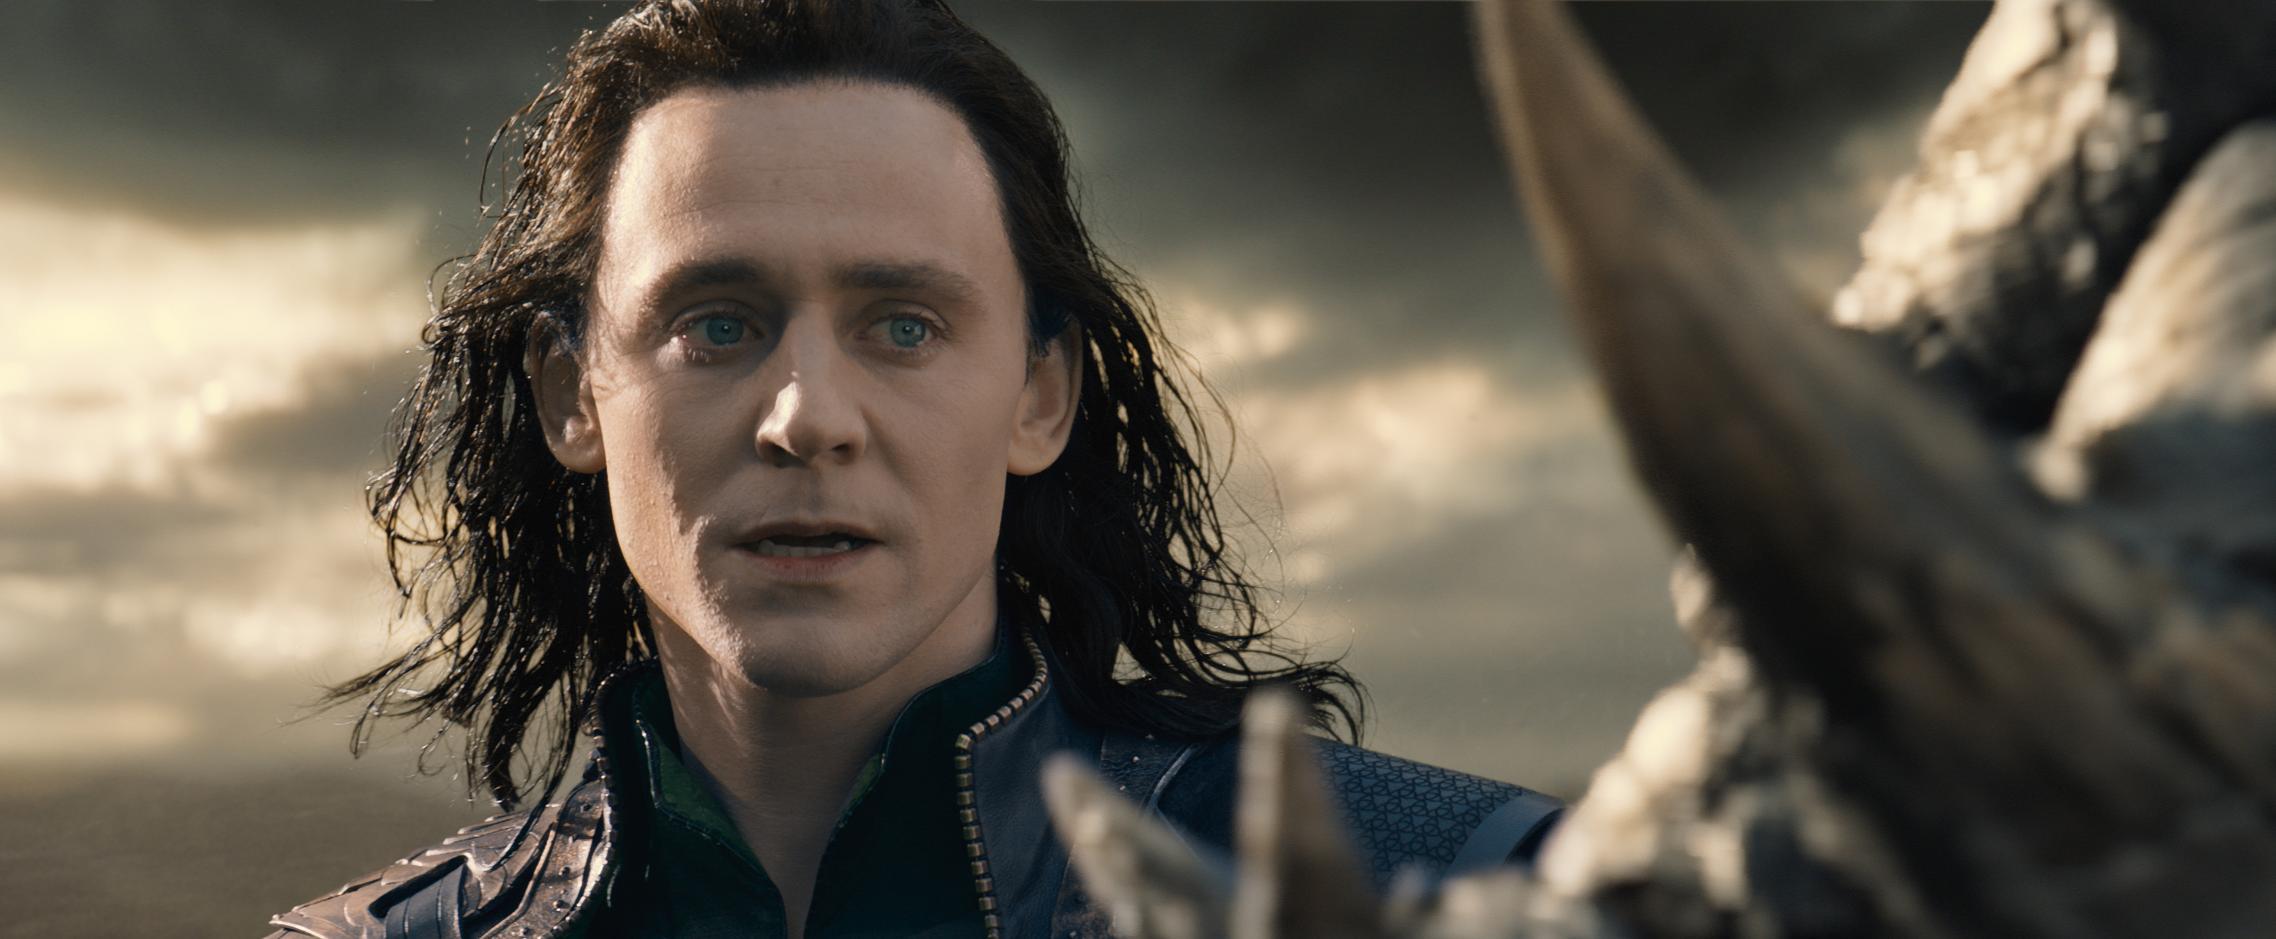 Thor-The-Dark-World_15